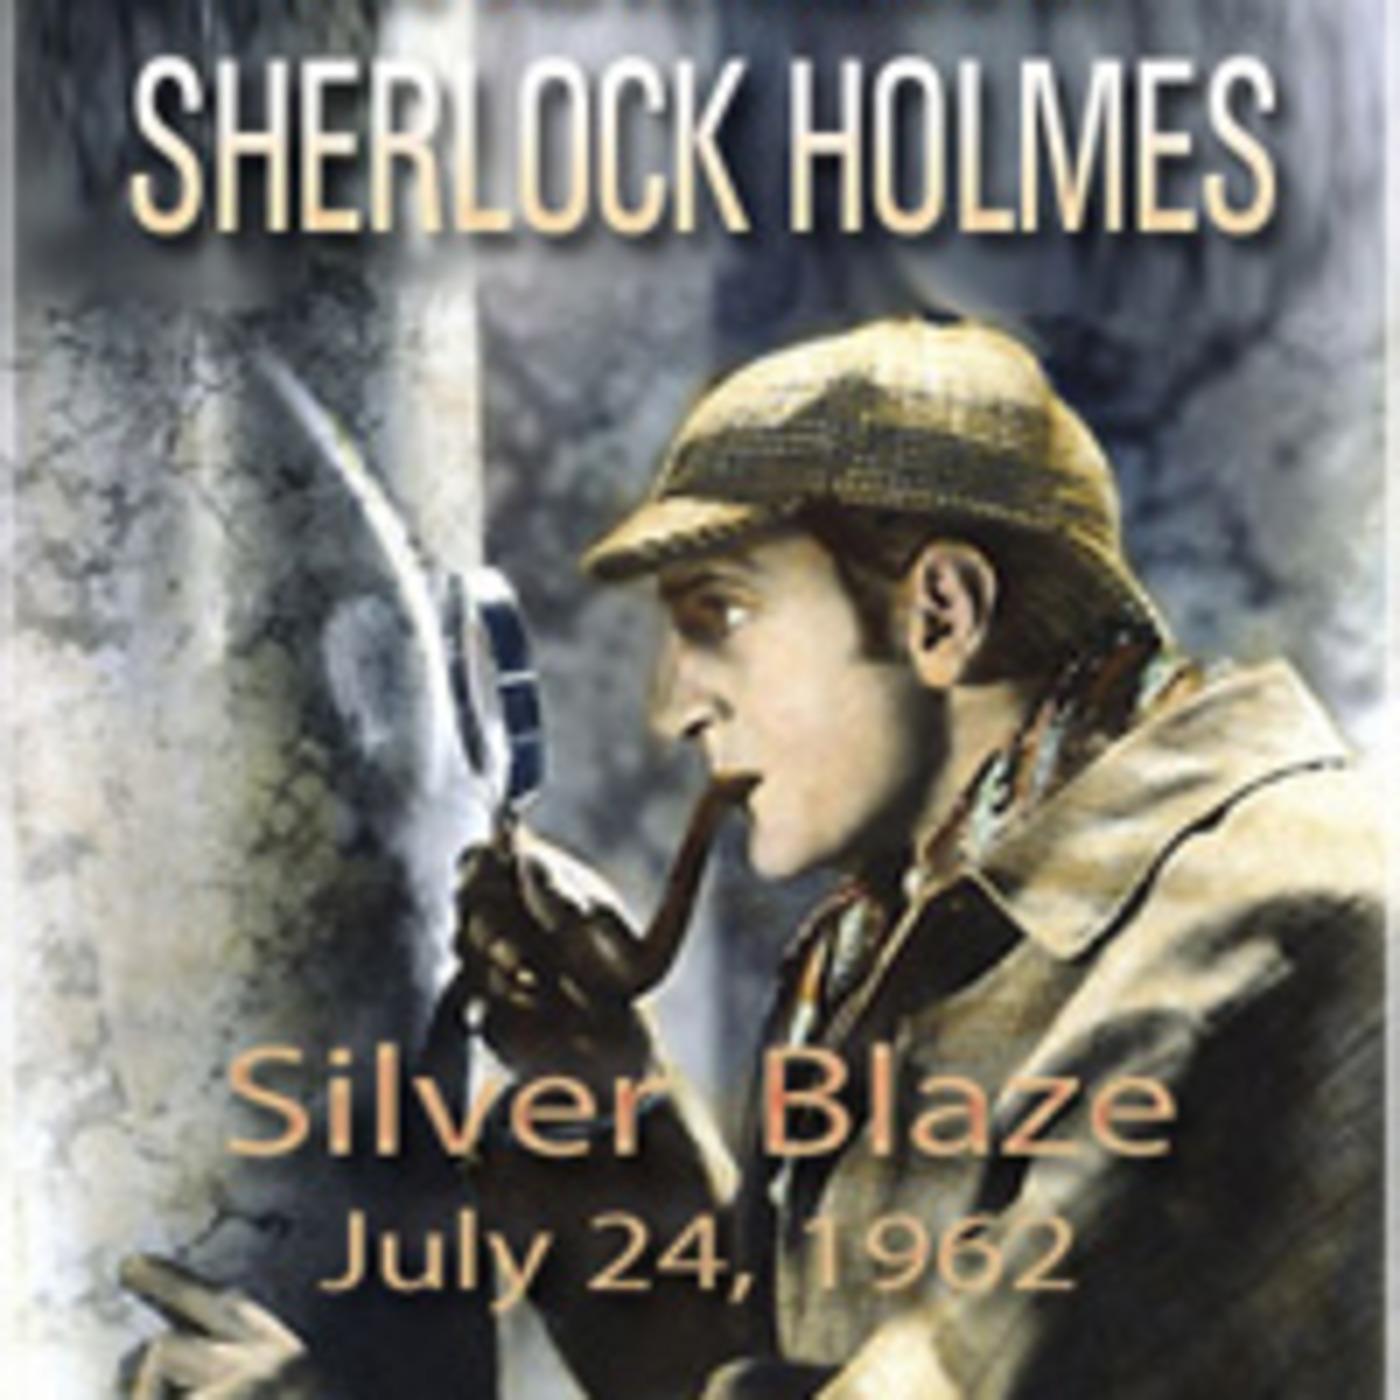 The Adventures Of Sherlock Holmes - Silver Blaze (07-24-62)